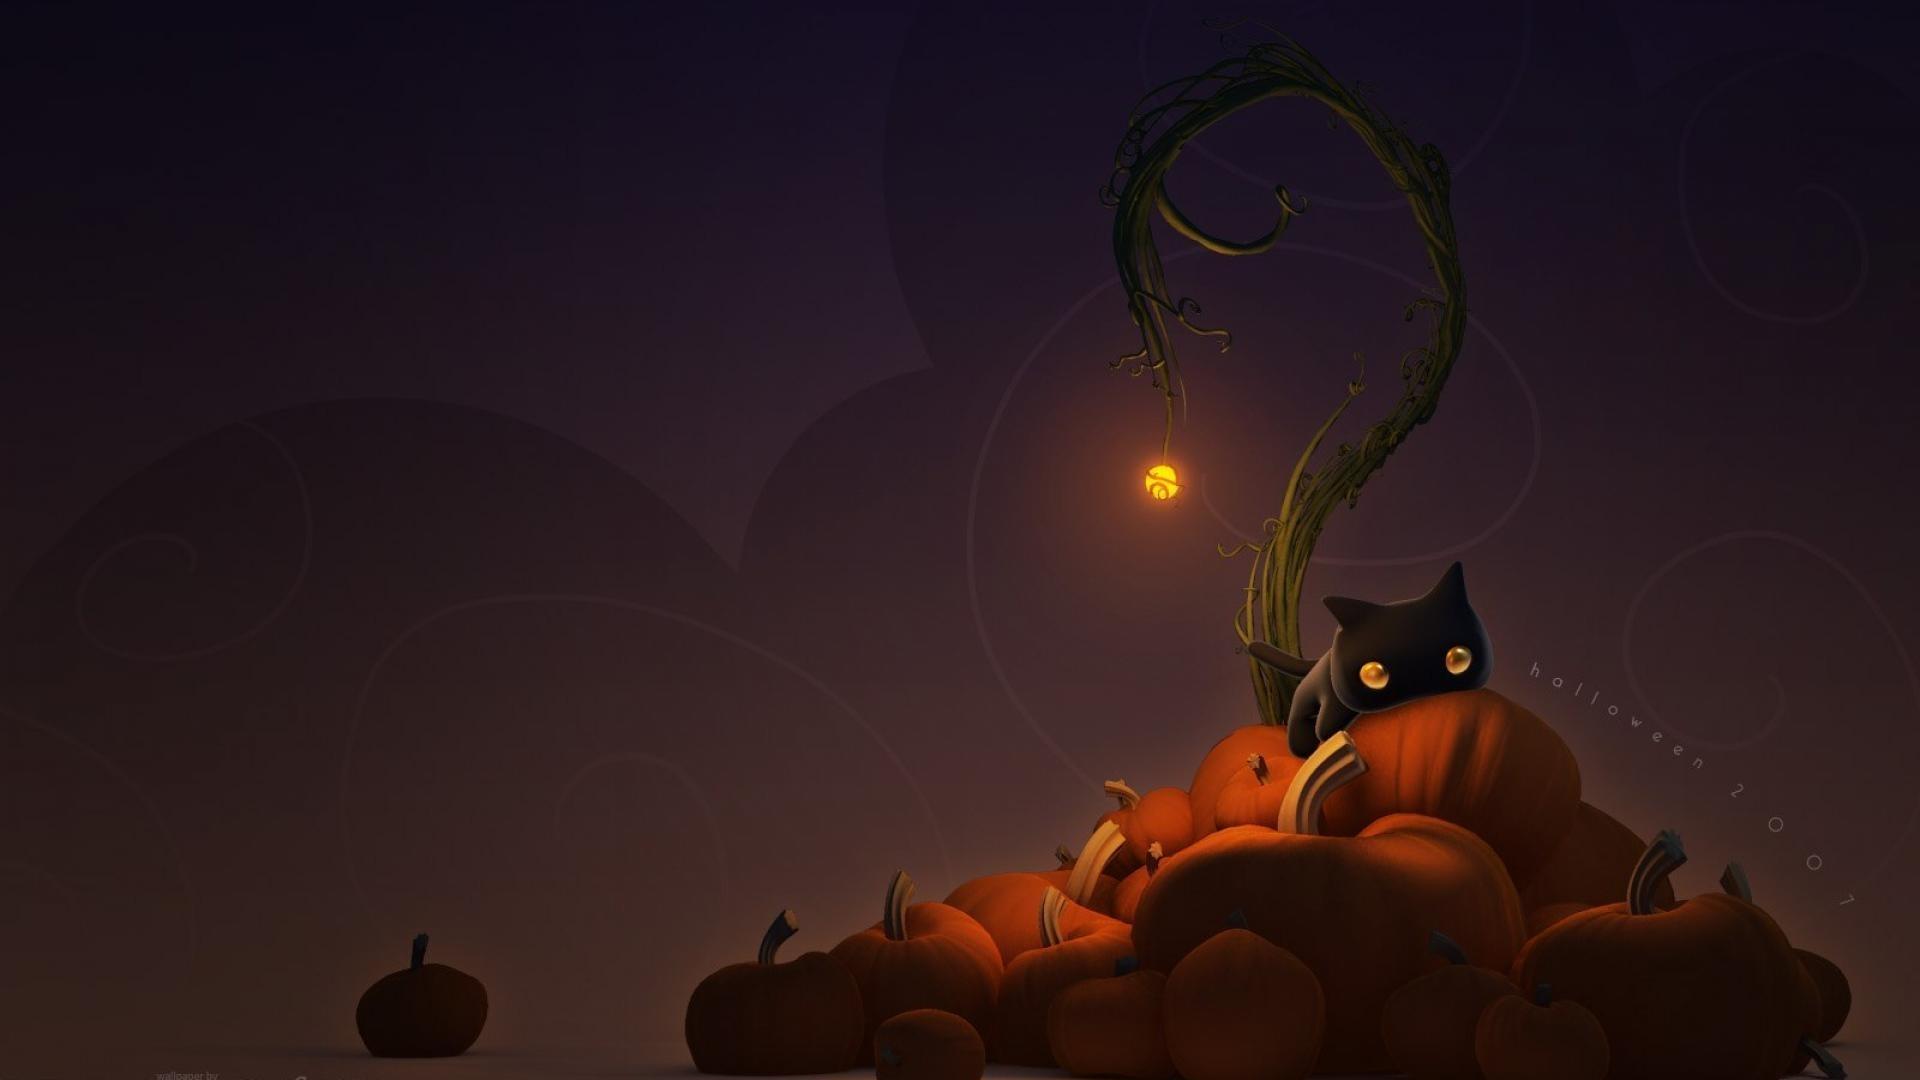 halloween cat hd wallpaper free download 4 - media file | pixelstalk